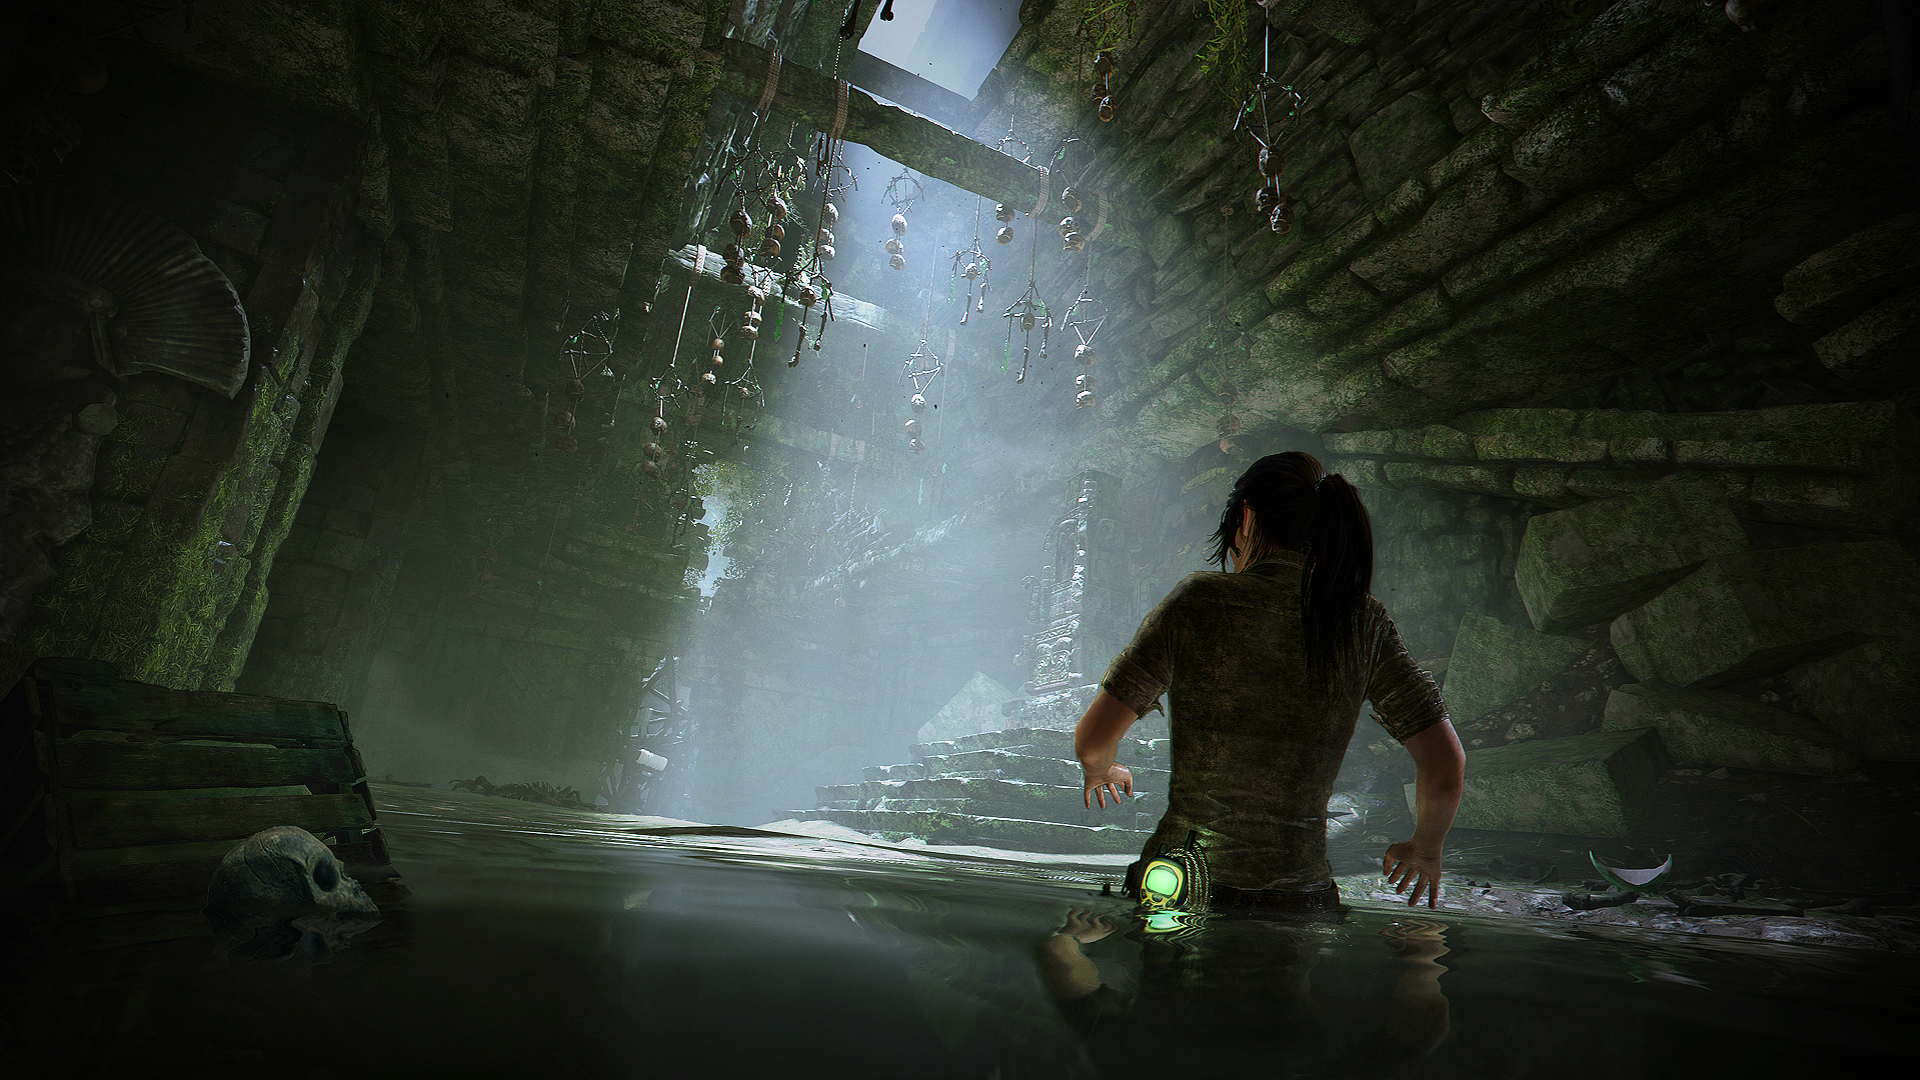 http://www.idgtv.es/archivos/201804/shadow-of-the-tomb-raider-img2.jpg